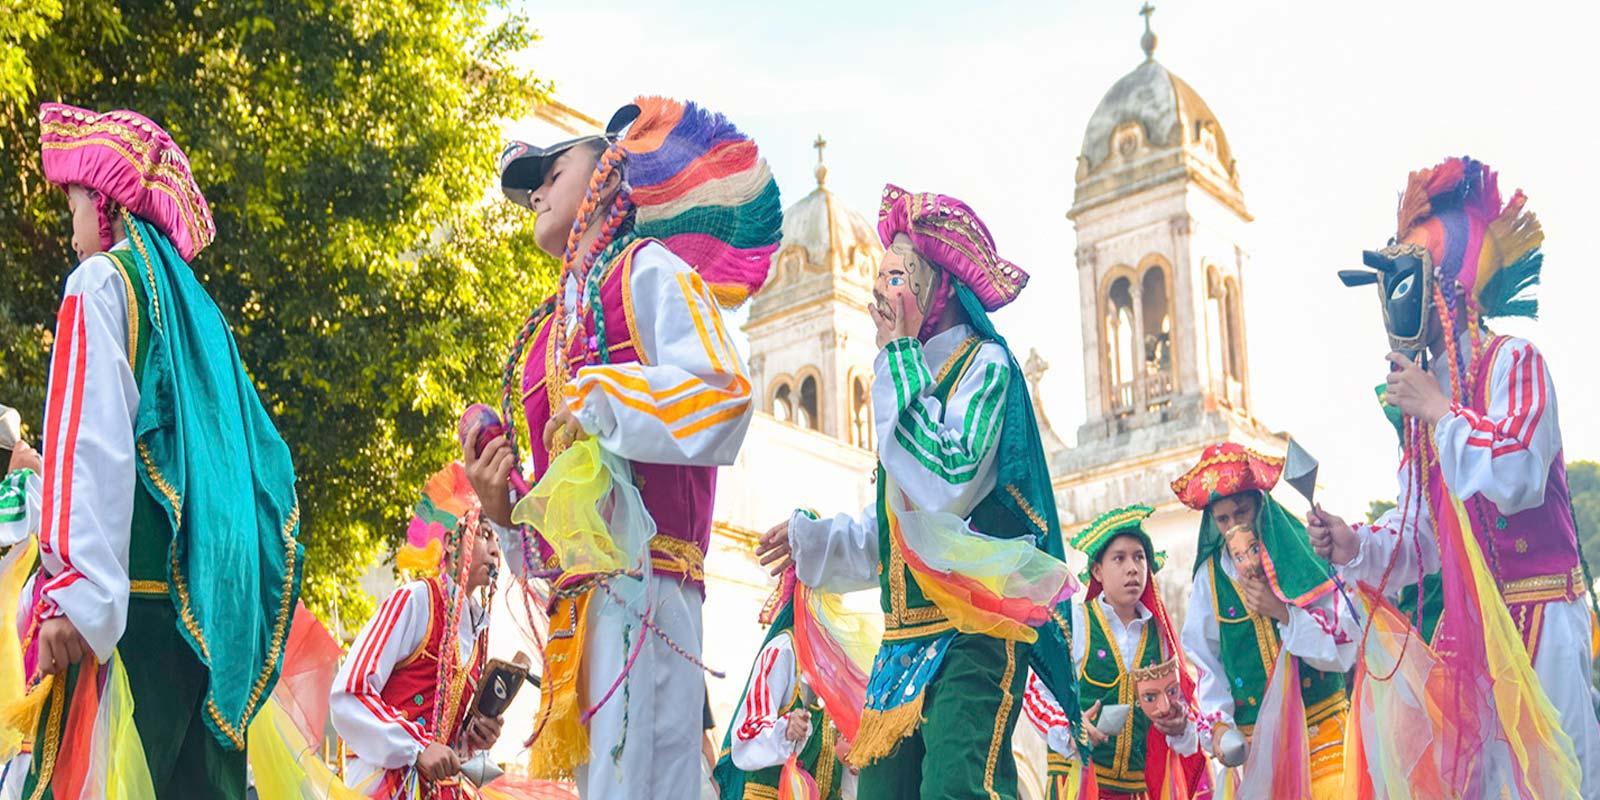 Güegüense-Nicaragua-Festival